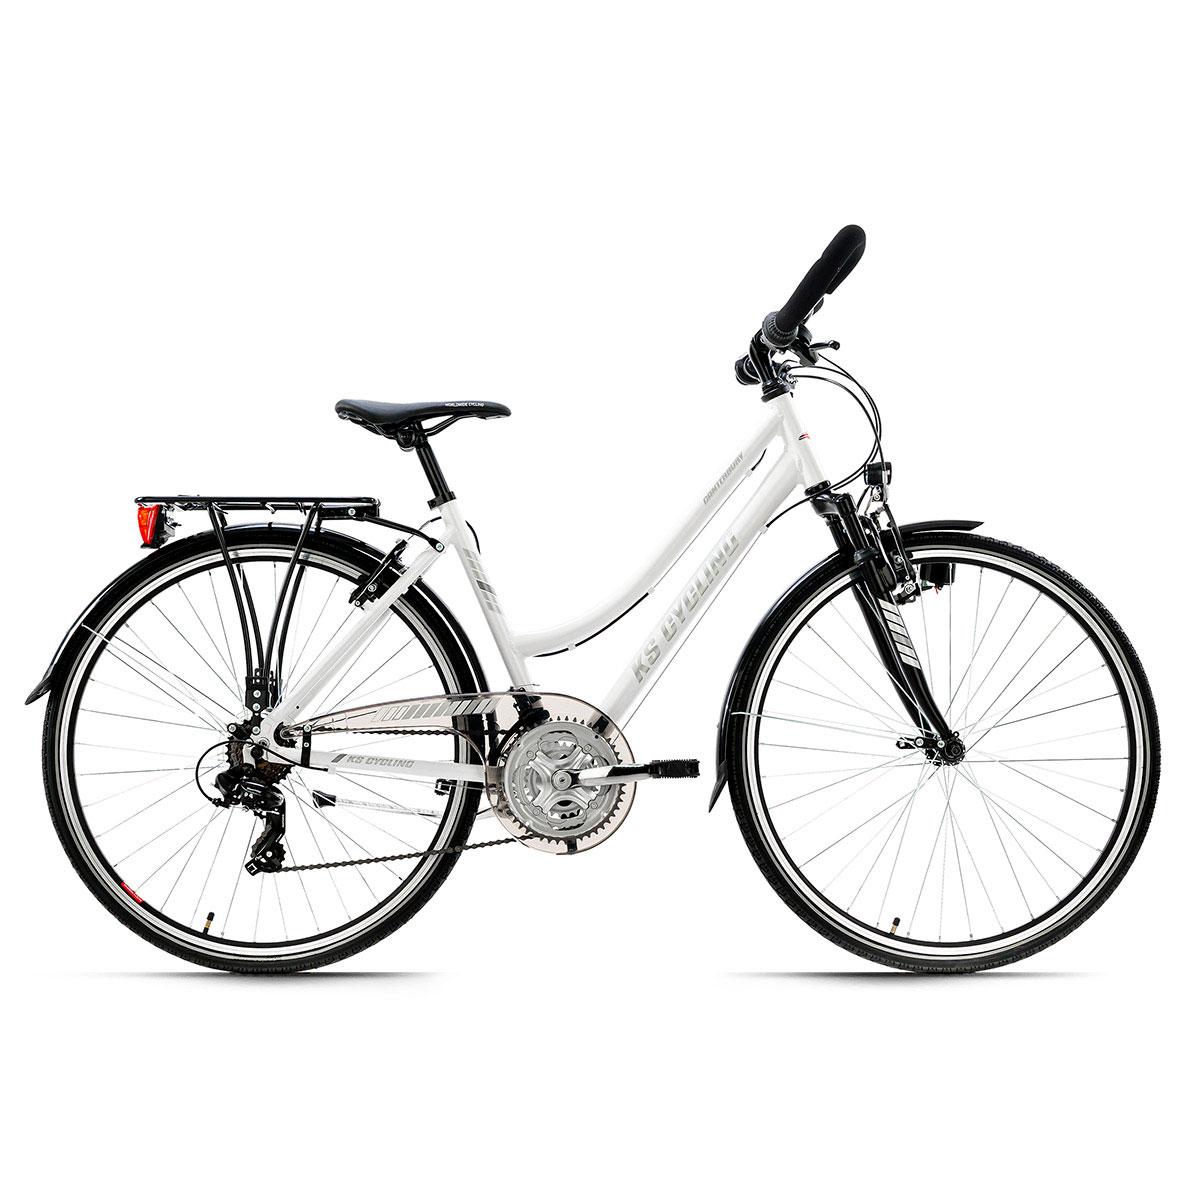 "Trekkingrad ""Canterbury"", Damen, Multilenker, 48cm, weiß matt Multipositionslenker | weiß matt | Damen | 48 cm"